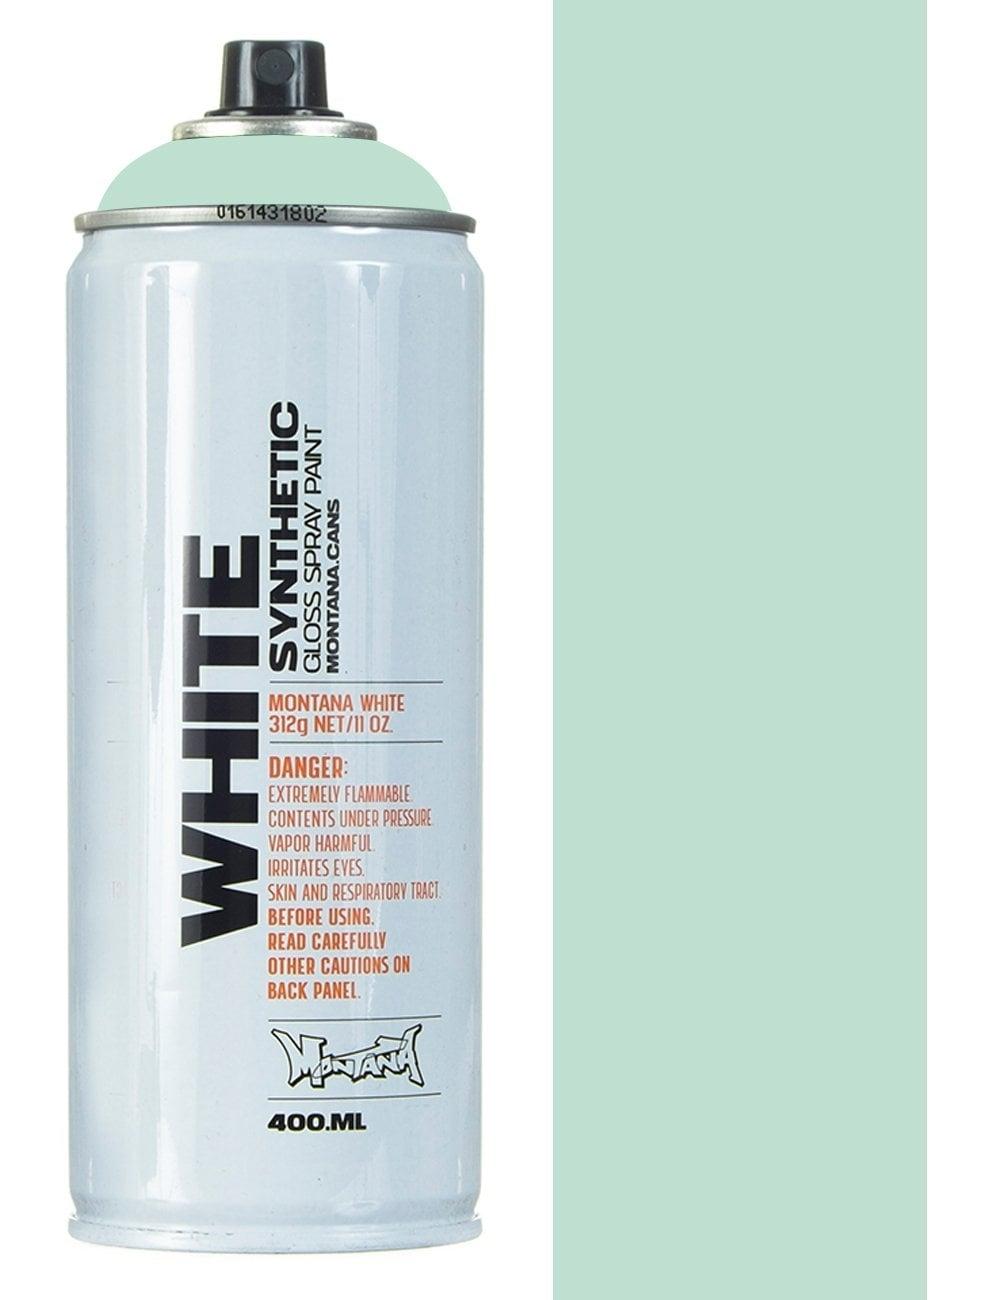 Montana White Sea Breeze Spray Paint 400ml Spray Paint